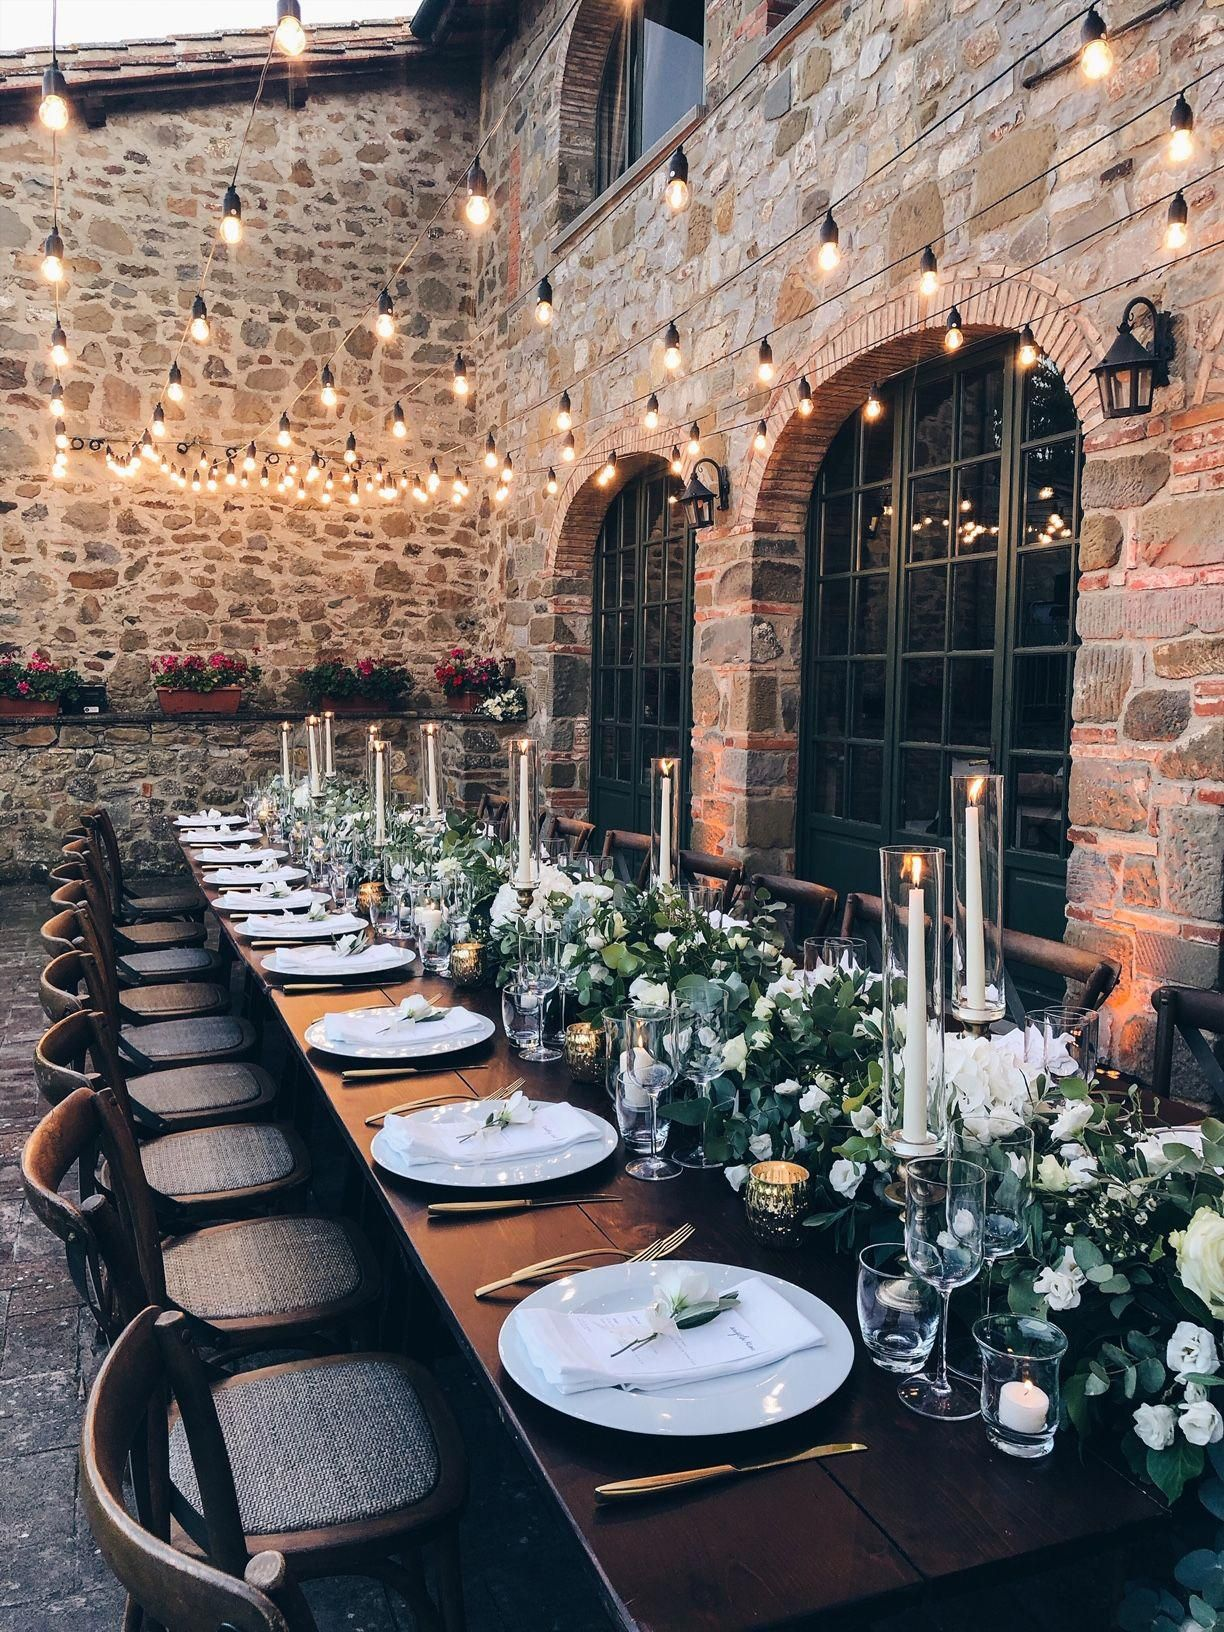 Mise En Place Wedding In Tuscany Wedding In Italy Destination Wedding Wedding Table Wedding Decorations Italianwed In 2020 Italy Wedding Tuscany Wedding Tuscany